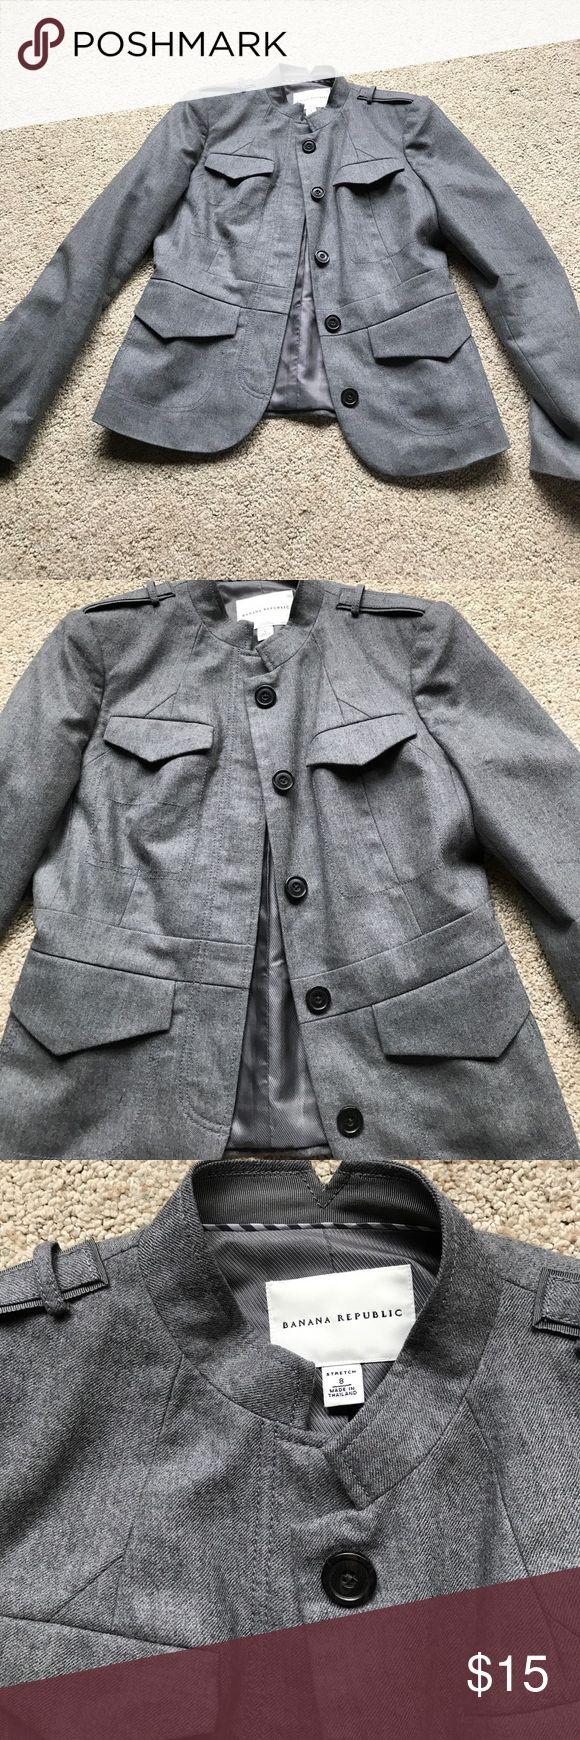 Wool Banana Republic Jacket Wool Banana Republic jacket in size 8. Never been worn and in great condition! Banana Republic Jackets & Coats Blazers